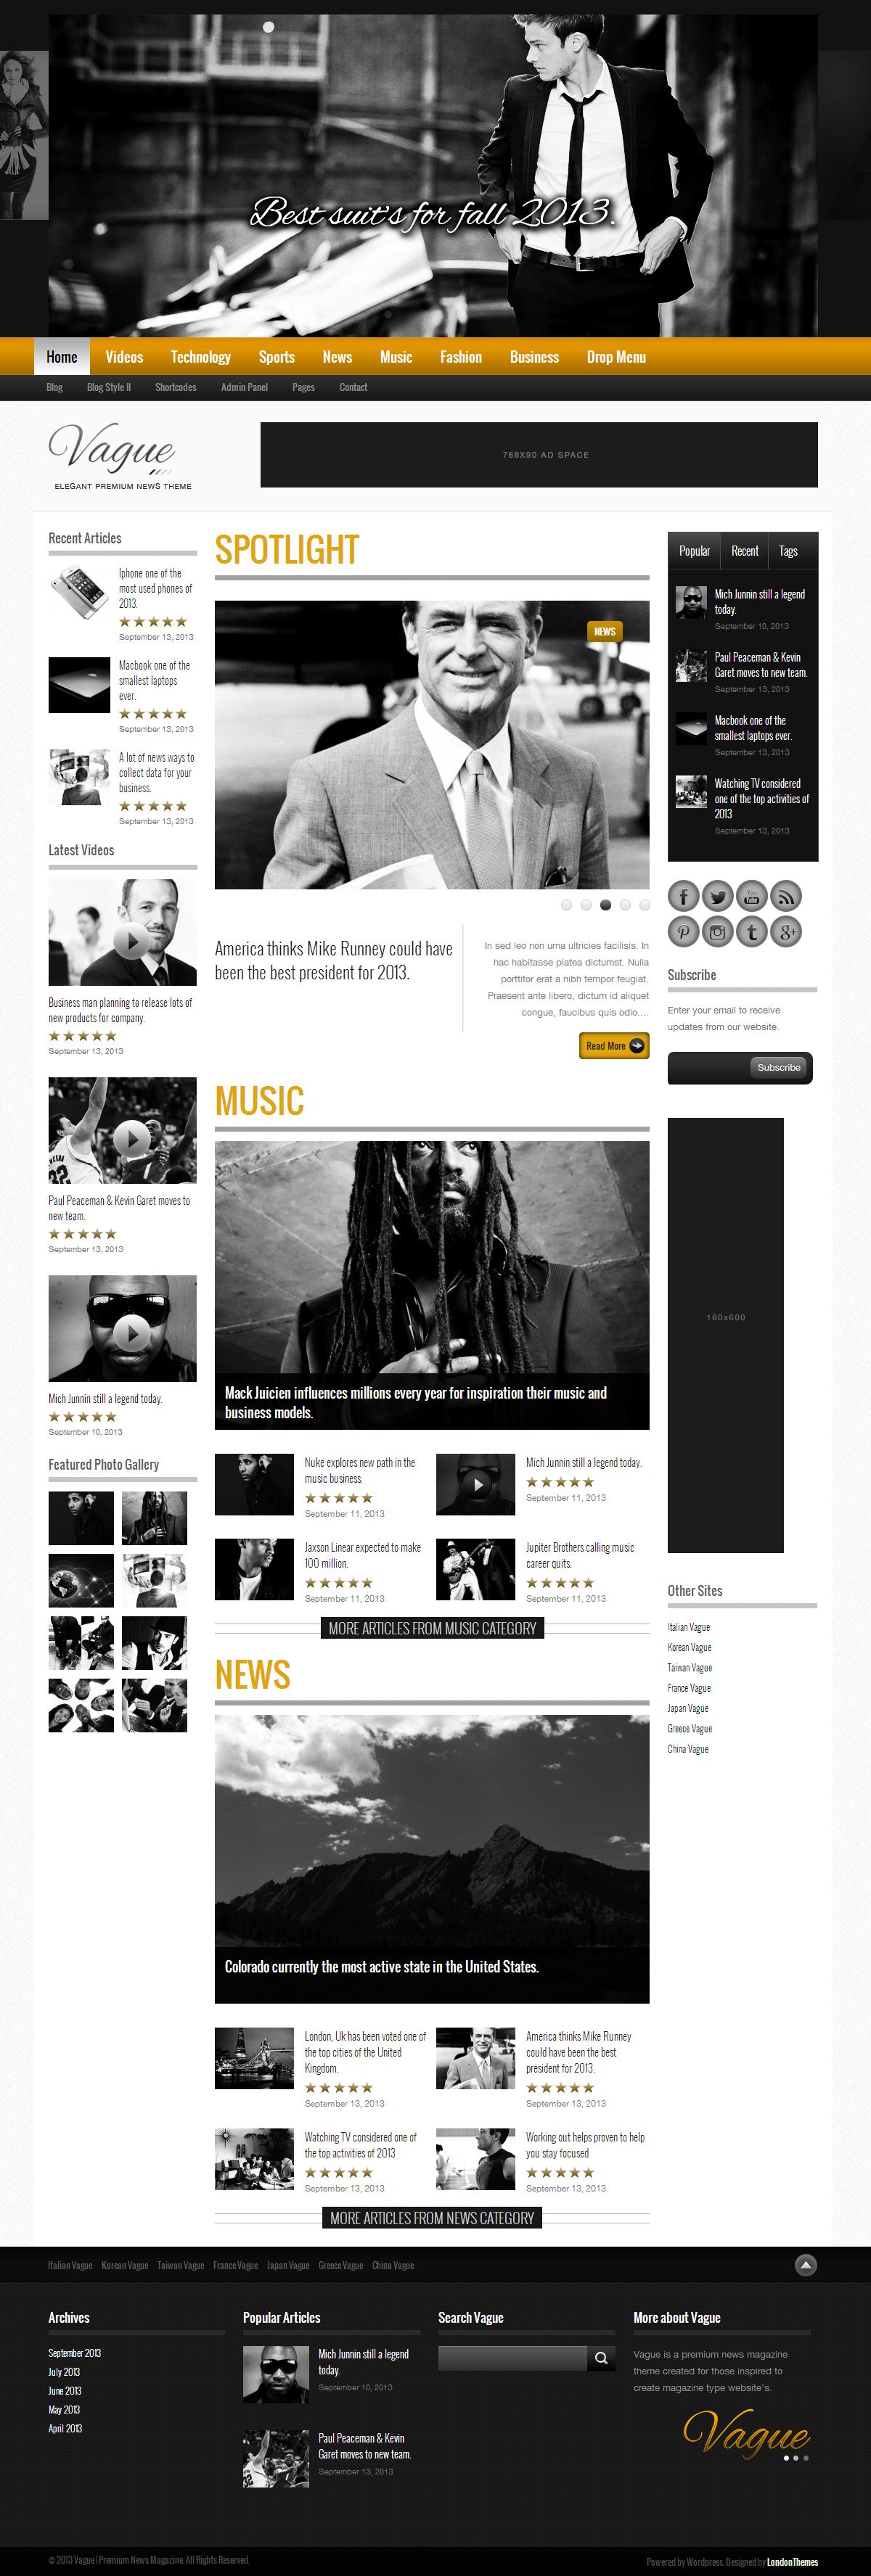 Vague - Premium Responsive News Magazine Theme